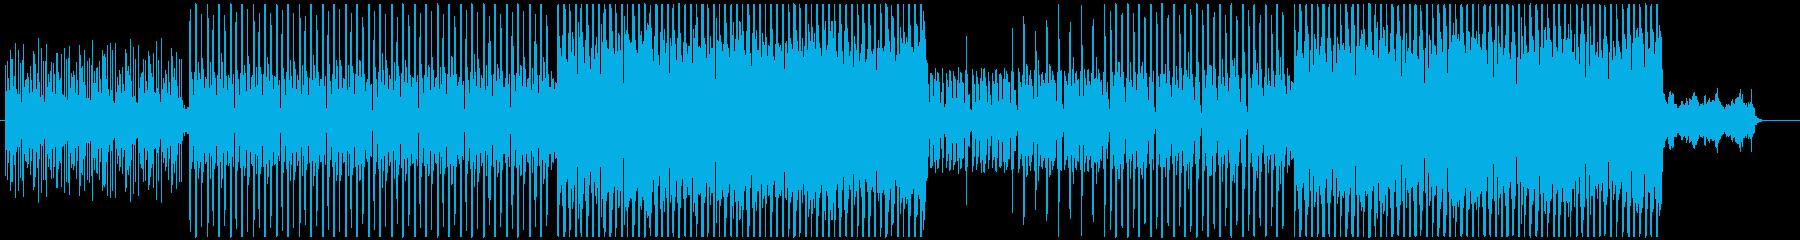 Western music, party EDM, pop sound!'s reproduced waveform